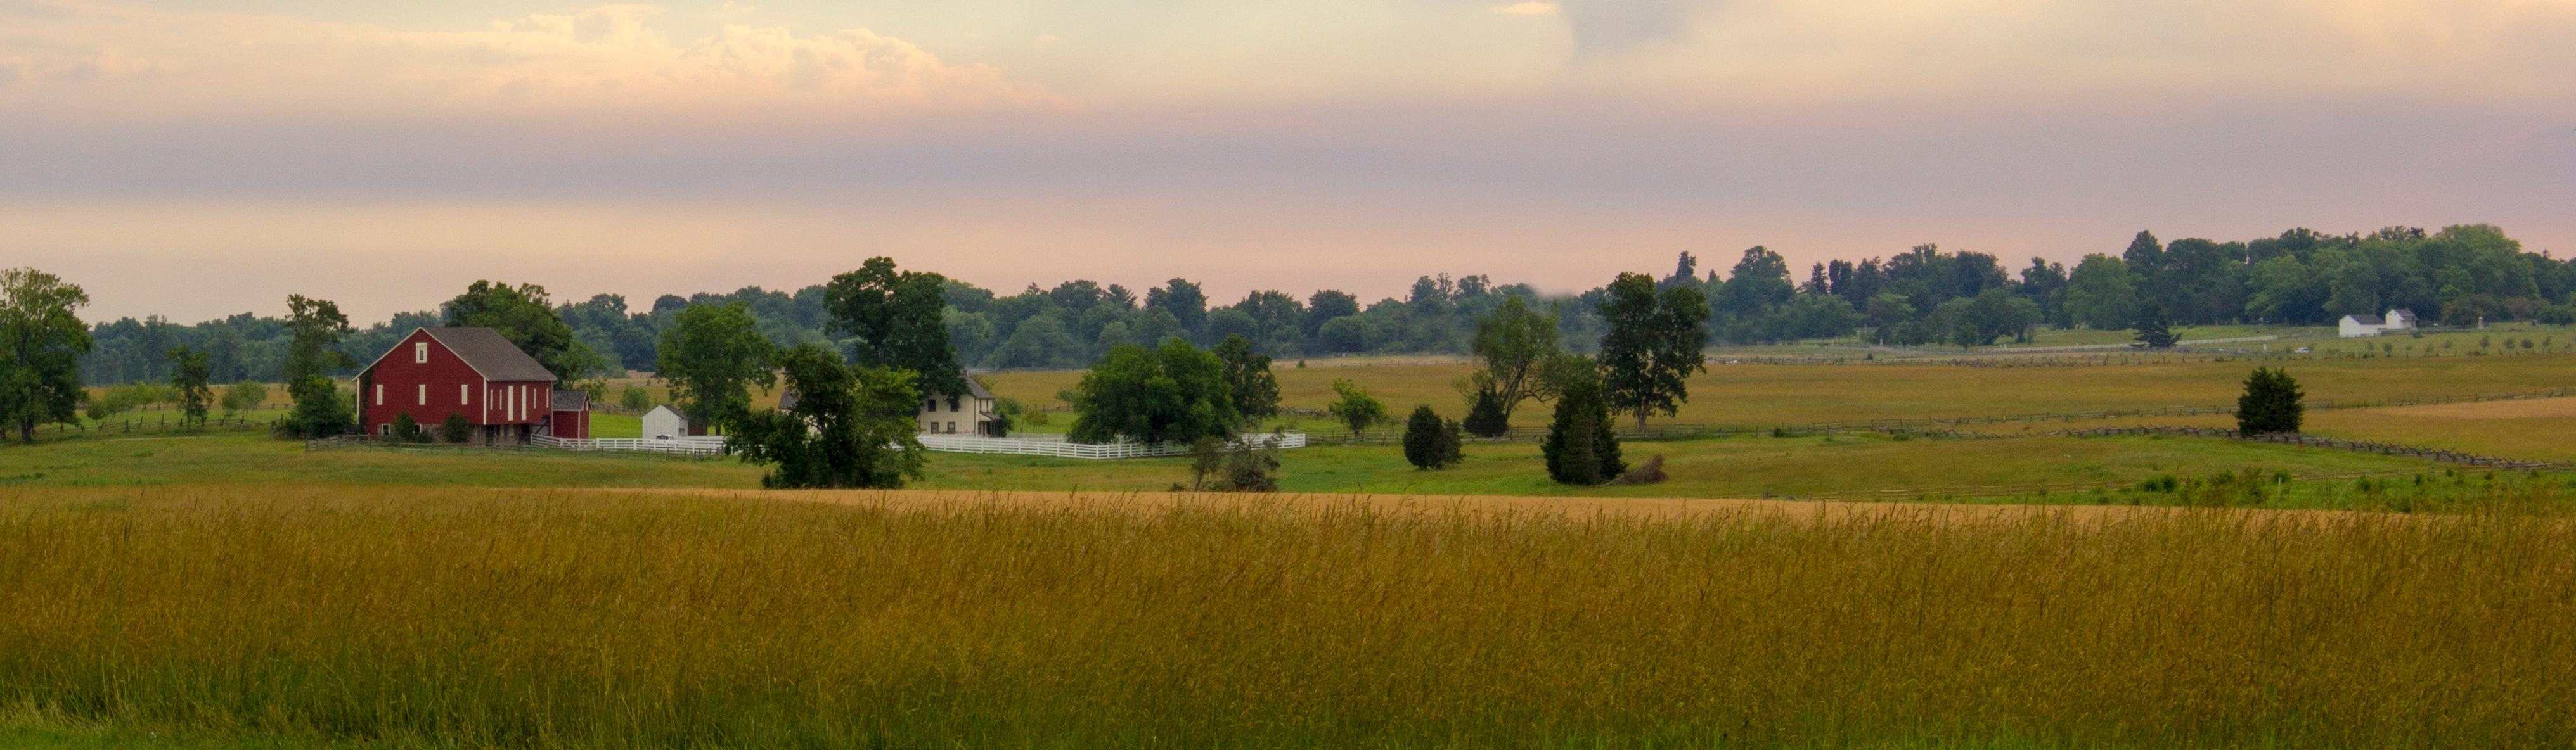 North Park Lincoln >> Gettysburg National Military Park (U.S. National Park Service)